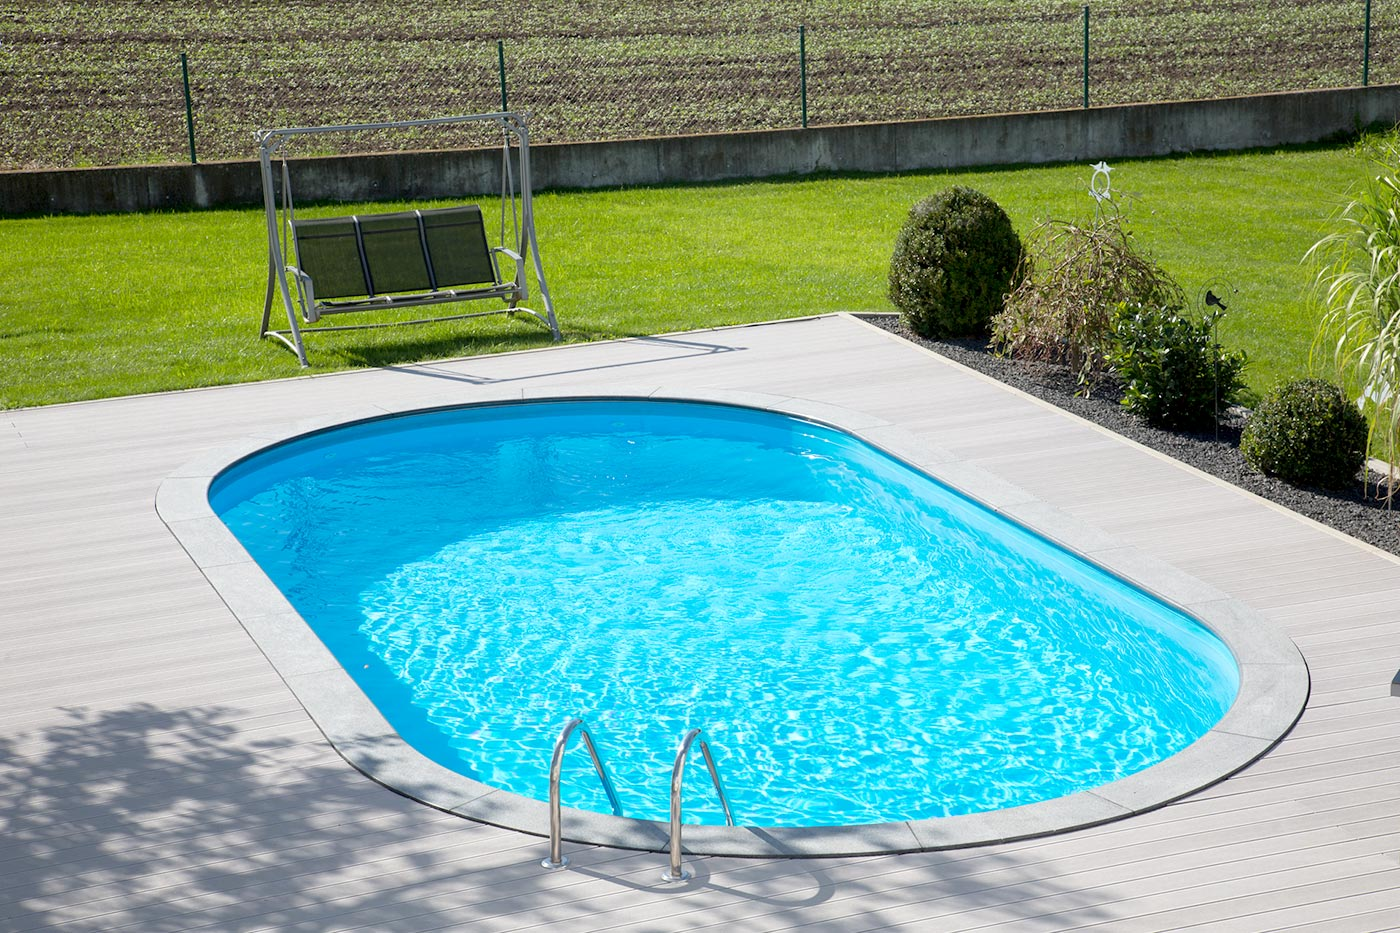 Ovalpool aufbauanleitung ovalbecken montage aufbau of for Aufbau pool mit stahlwand